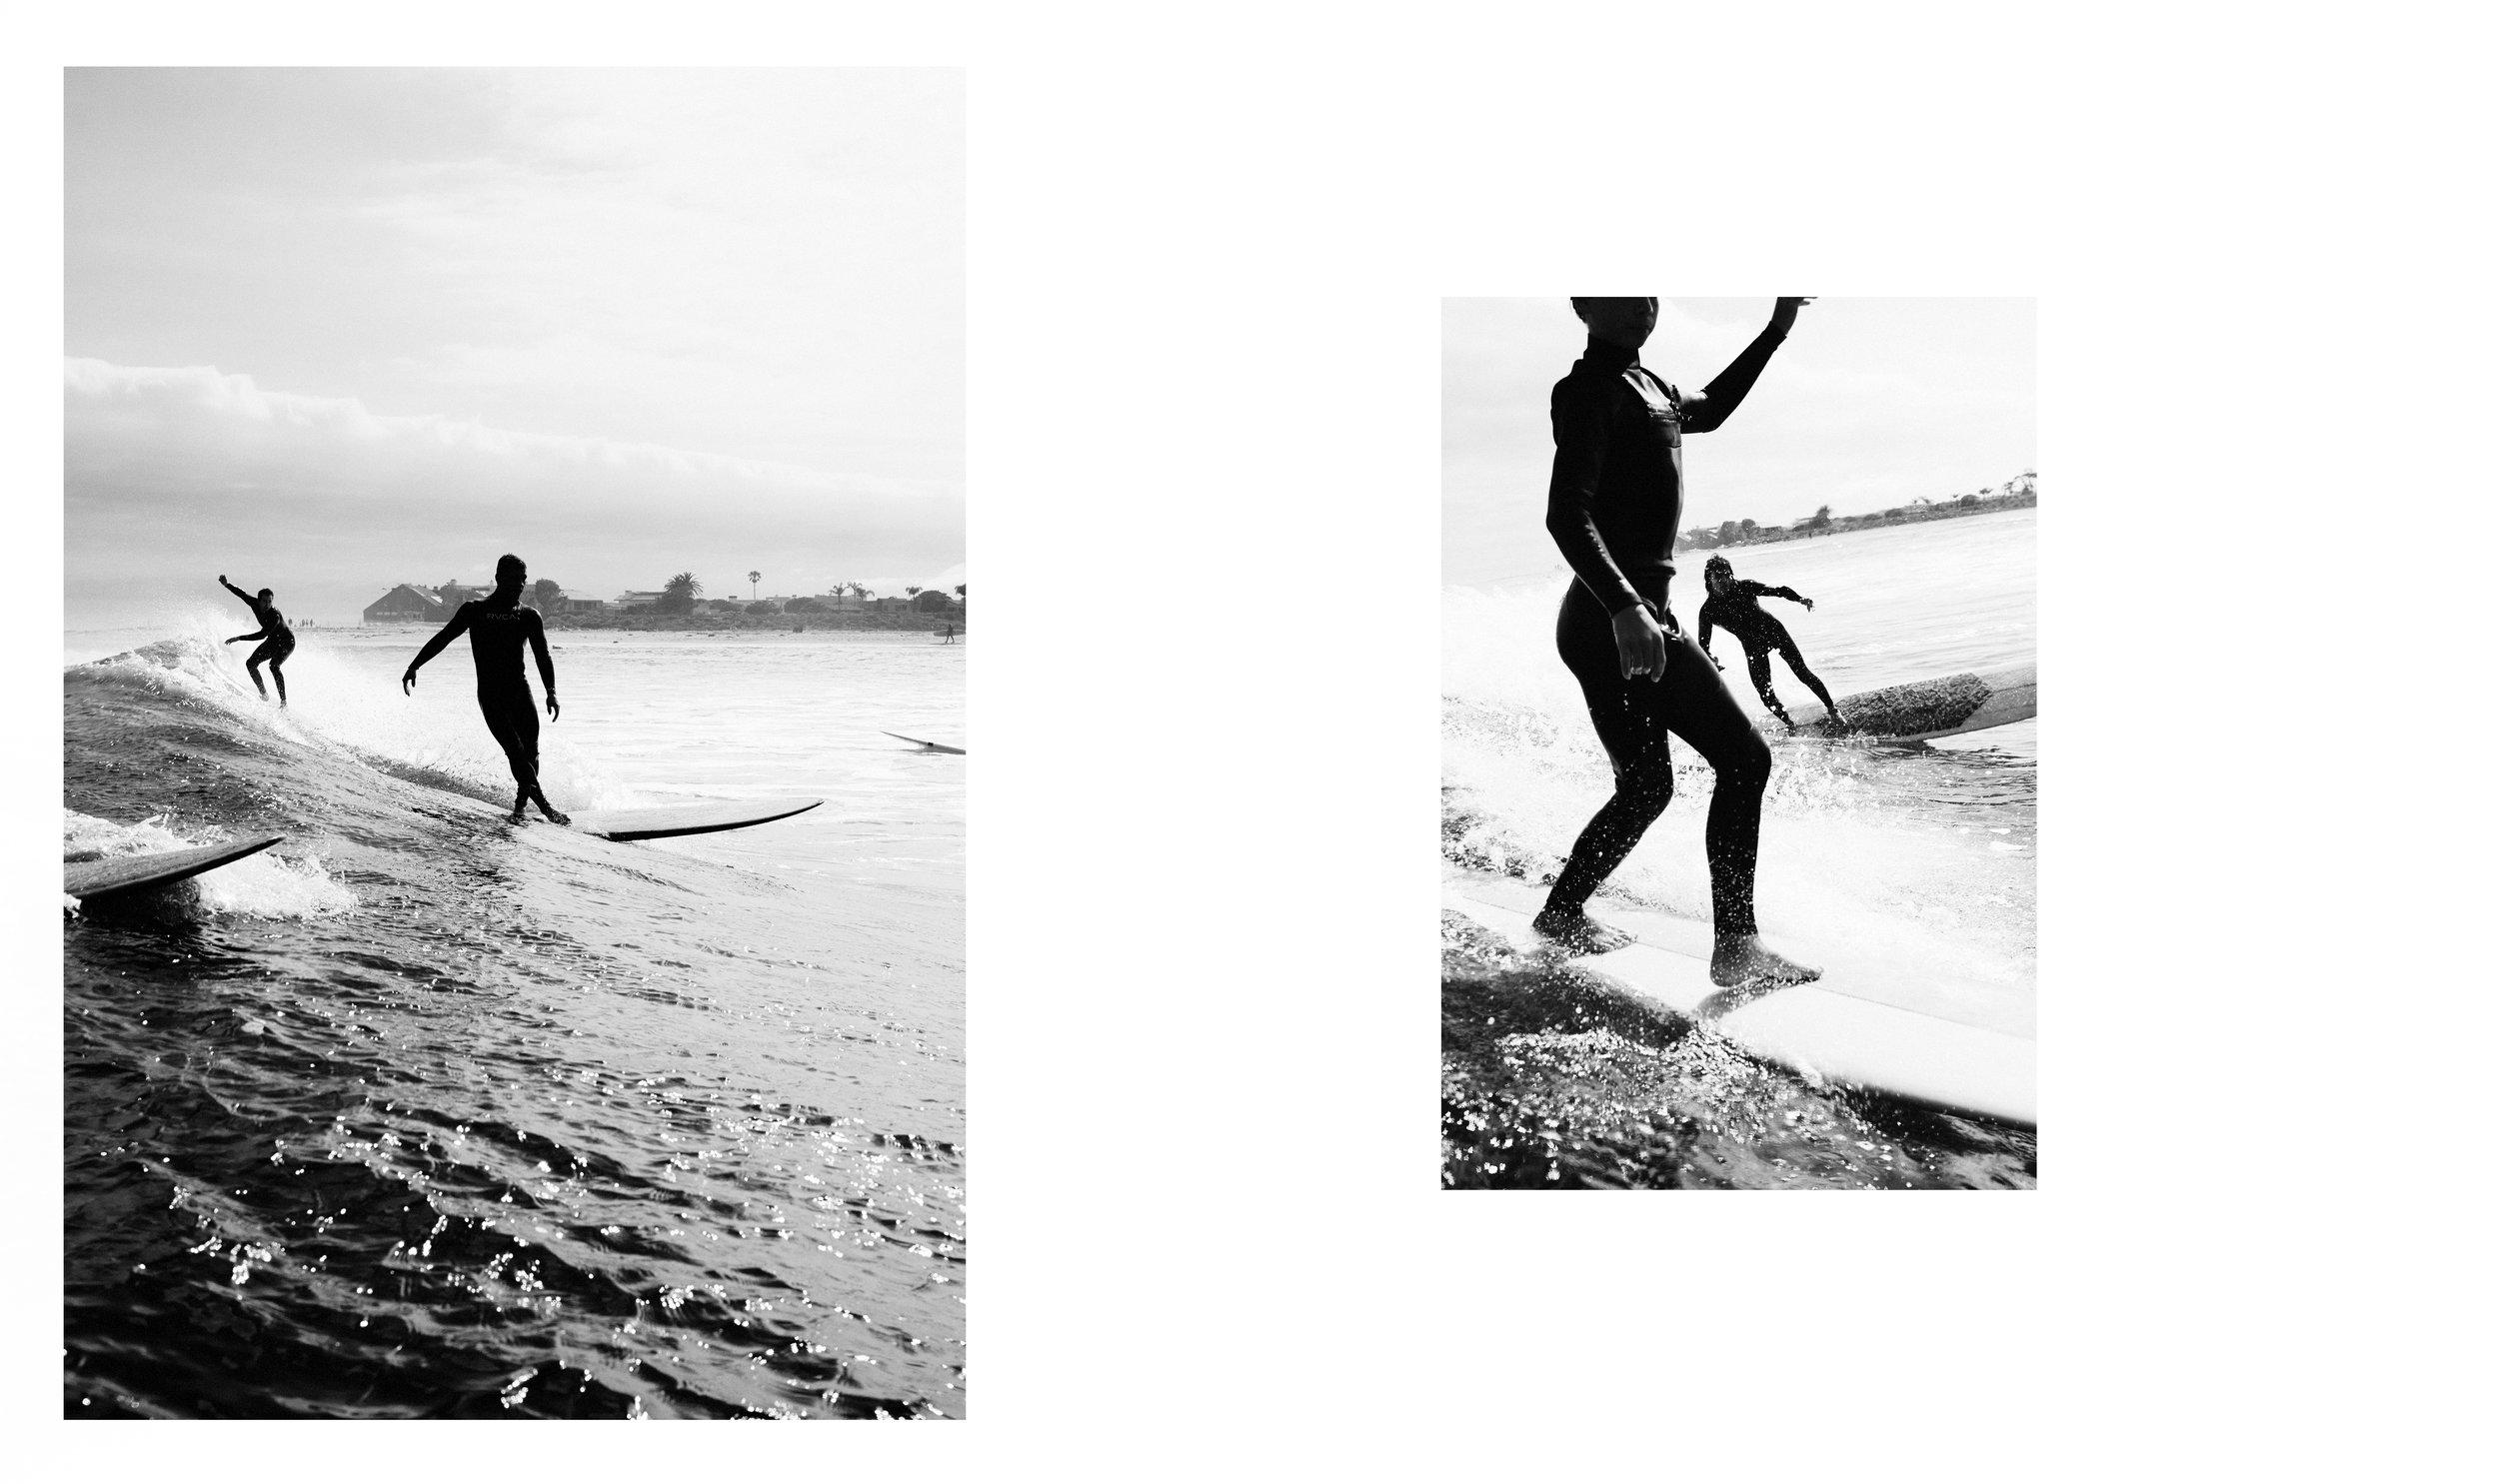 Nathan Strom / Tosh Tudor - Malibu, CA.